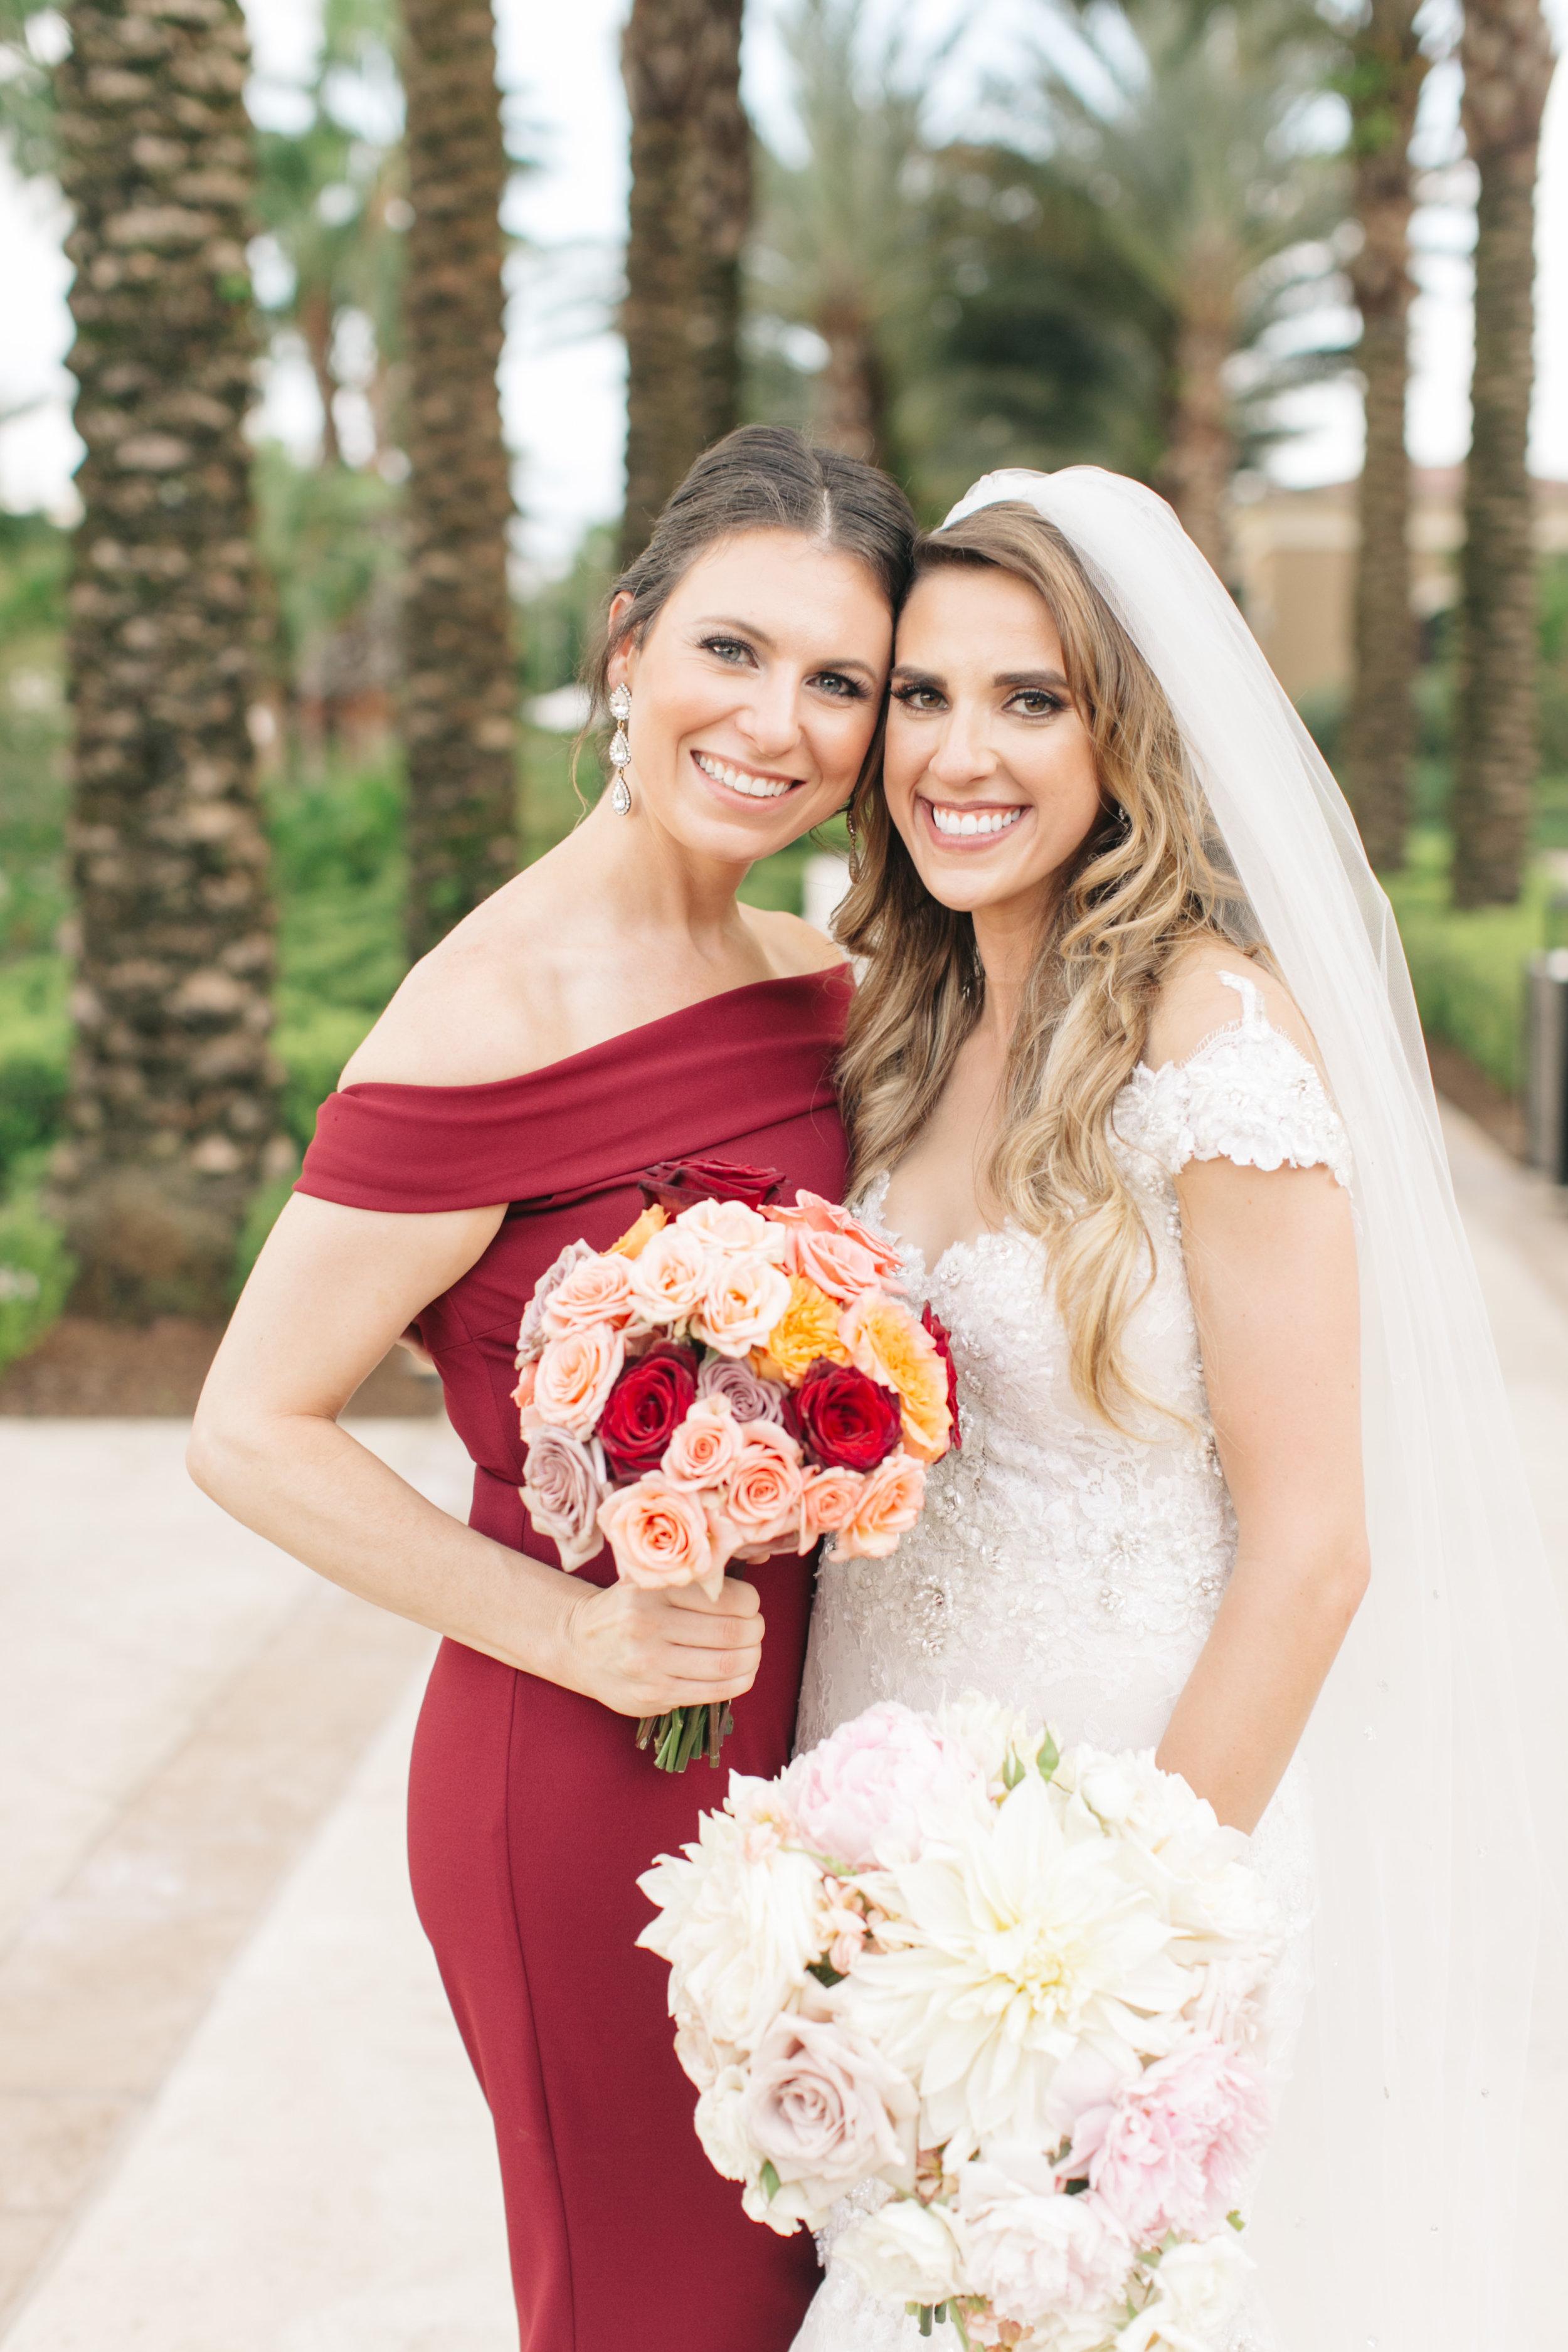 Wedding Photographer:  Joey Kennedy Photography  | Wedding Designer:  Whitney Carillon  | Wedding Location: Four Seasons Resort Orlando